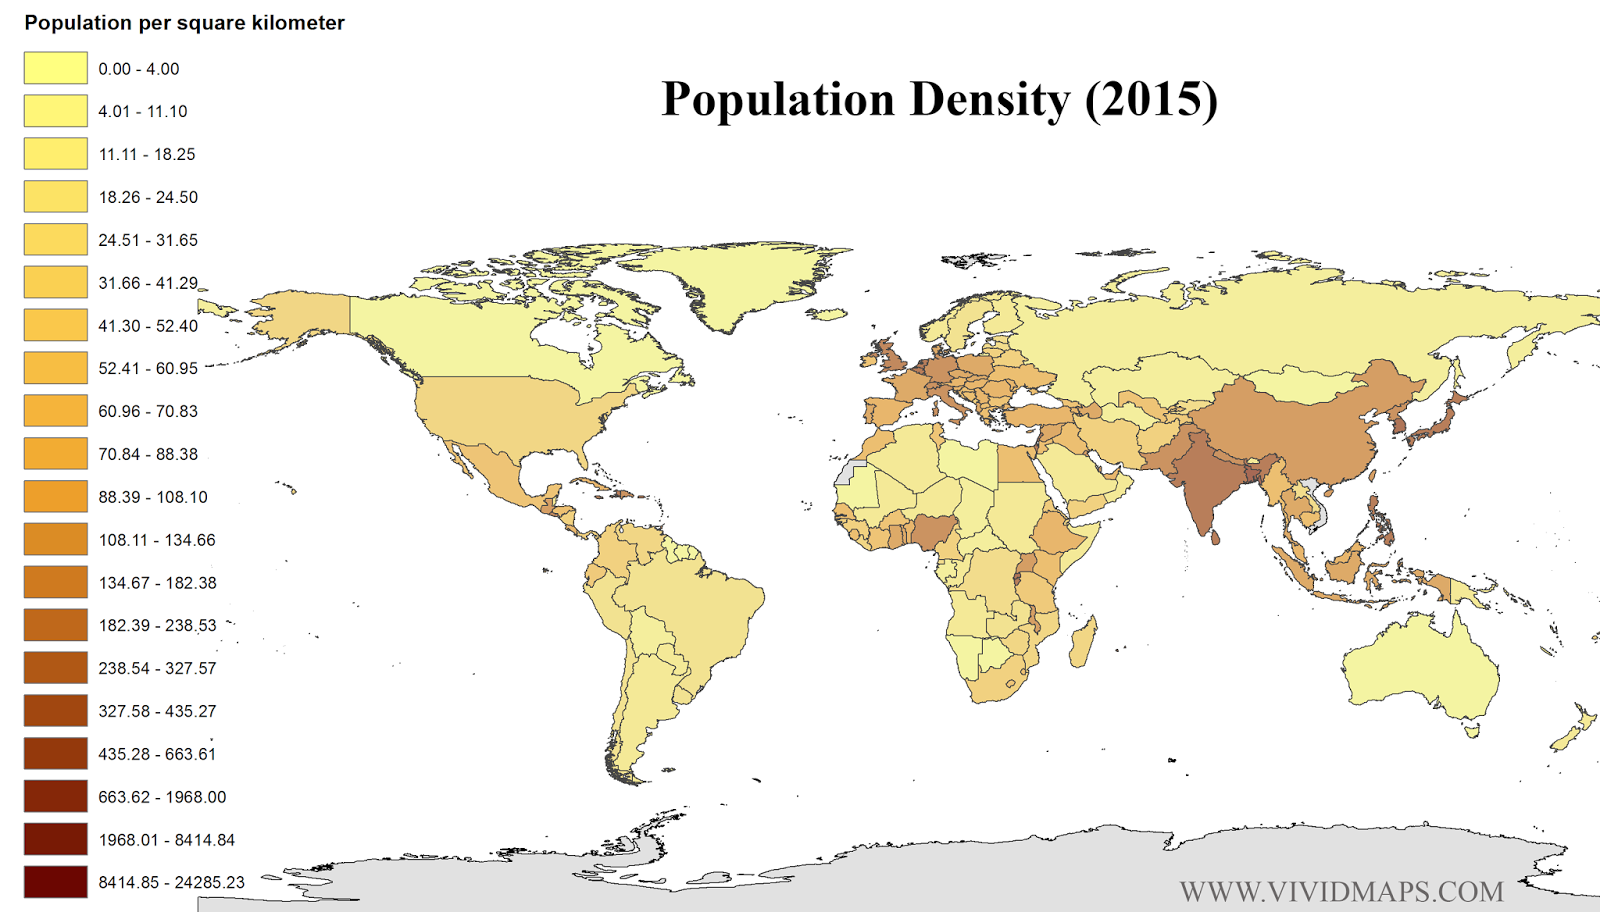 Population Density (2015)